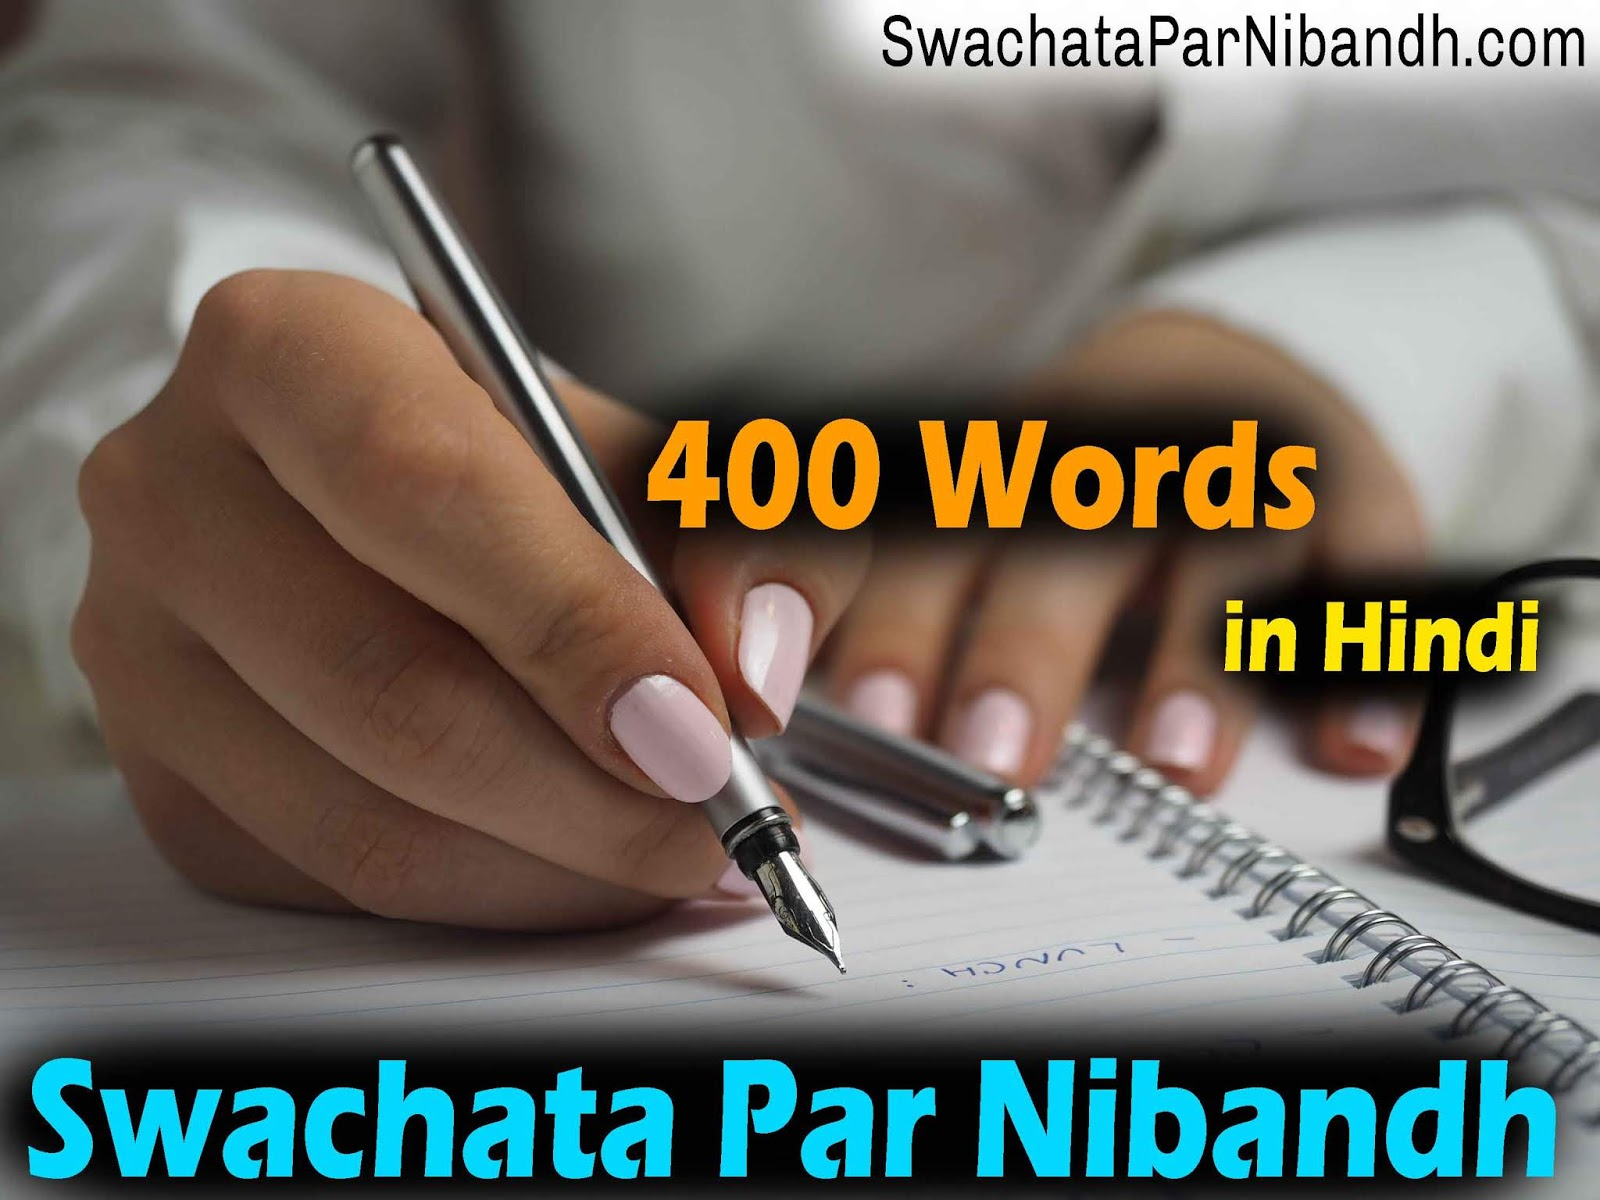 Swachata Essay In Hindi Pdf, Swachata Ka Mahatva Par Nibandh 400 Shabd, Swachata Ke Upar Nibandh 400/ 500 Words, Swachata Par Nibandh Hindi Mein 400 Shabd, Swachhata Per Nibandh 400/ 500 Words,